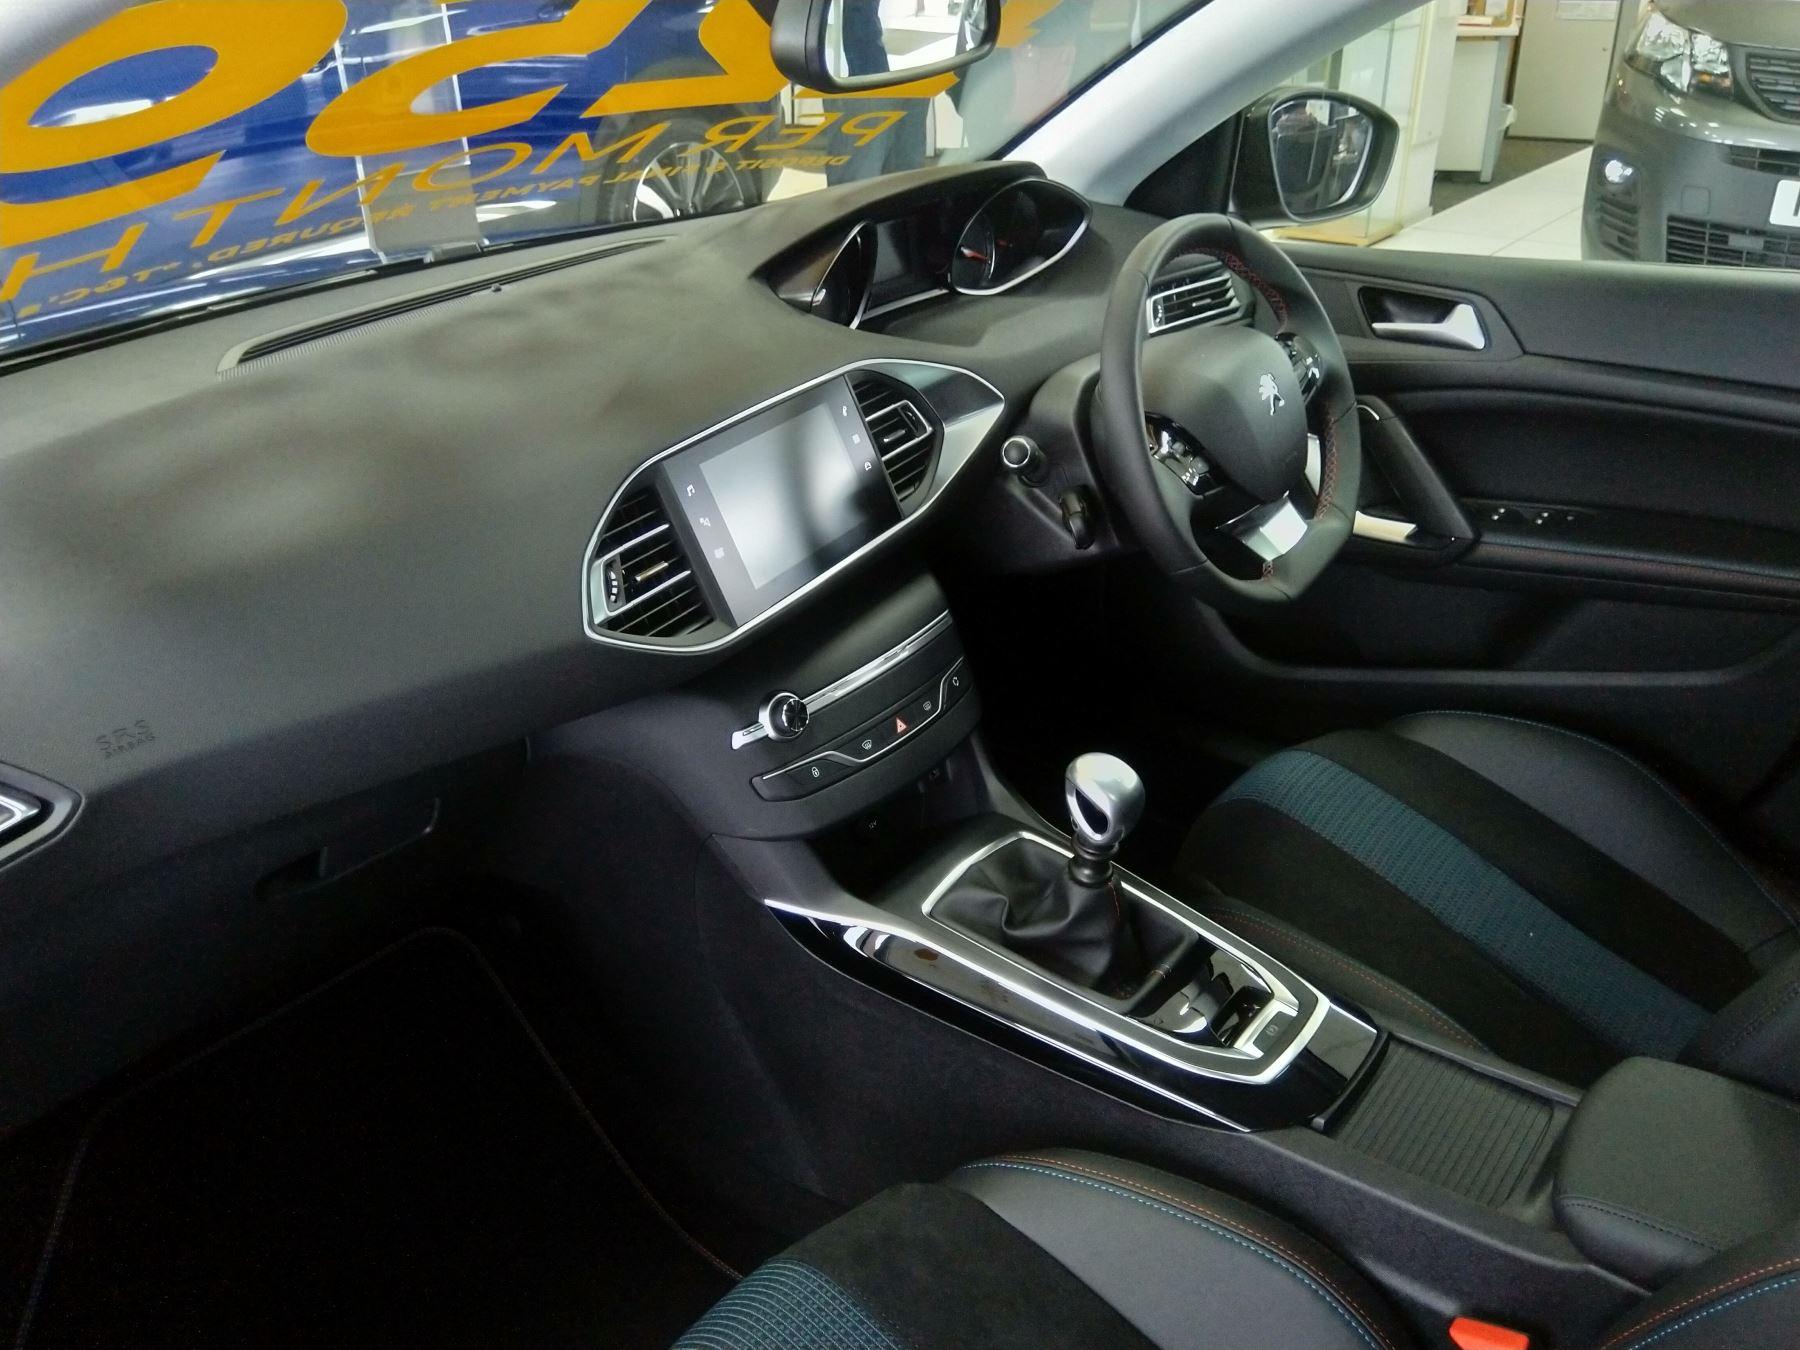 Peugeot 308 1.5 BlueHDi 130 Tech Edition image 4